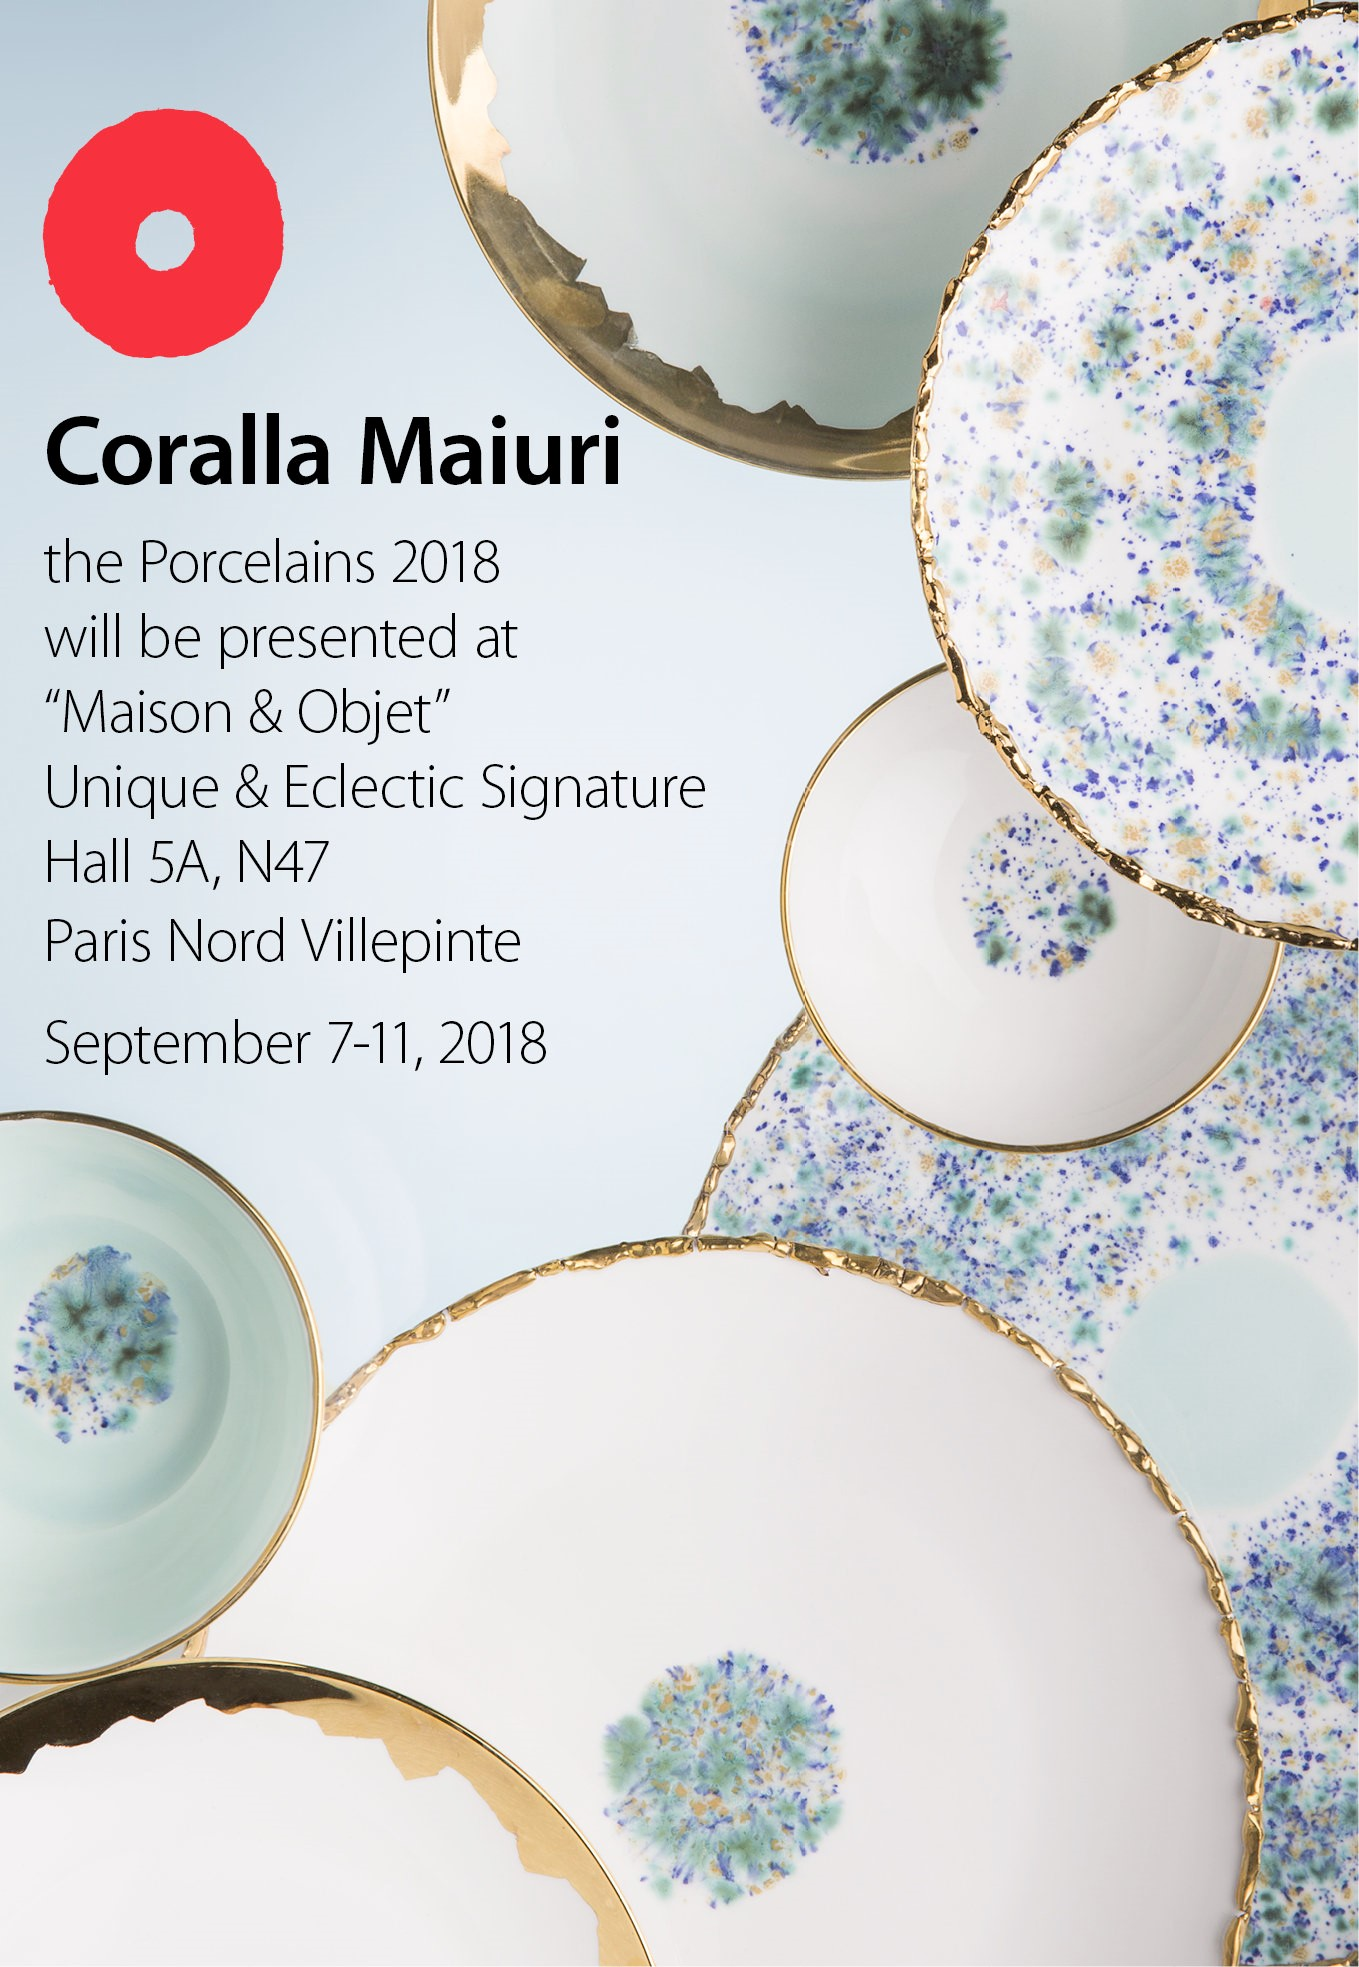 Coralla Maiuri @ Maison & Objet Paris 2018